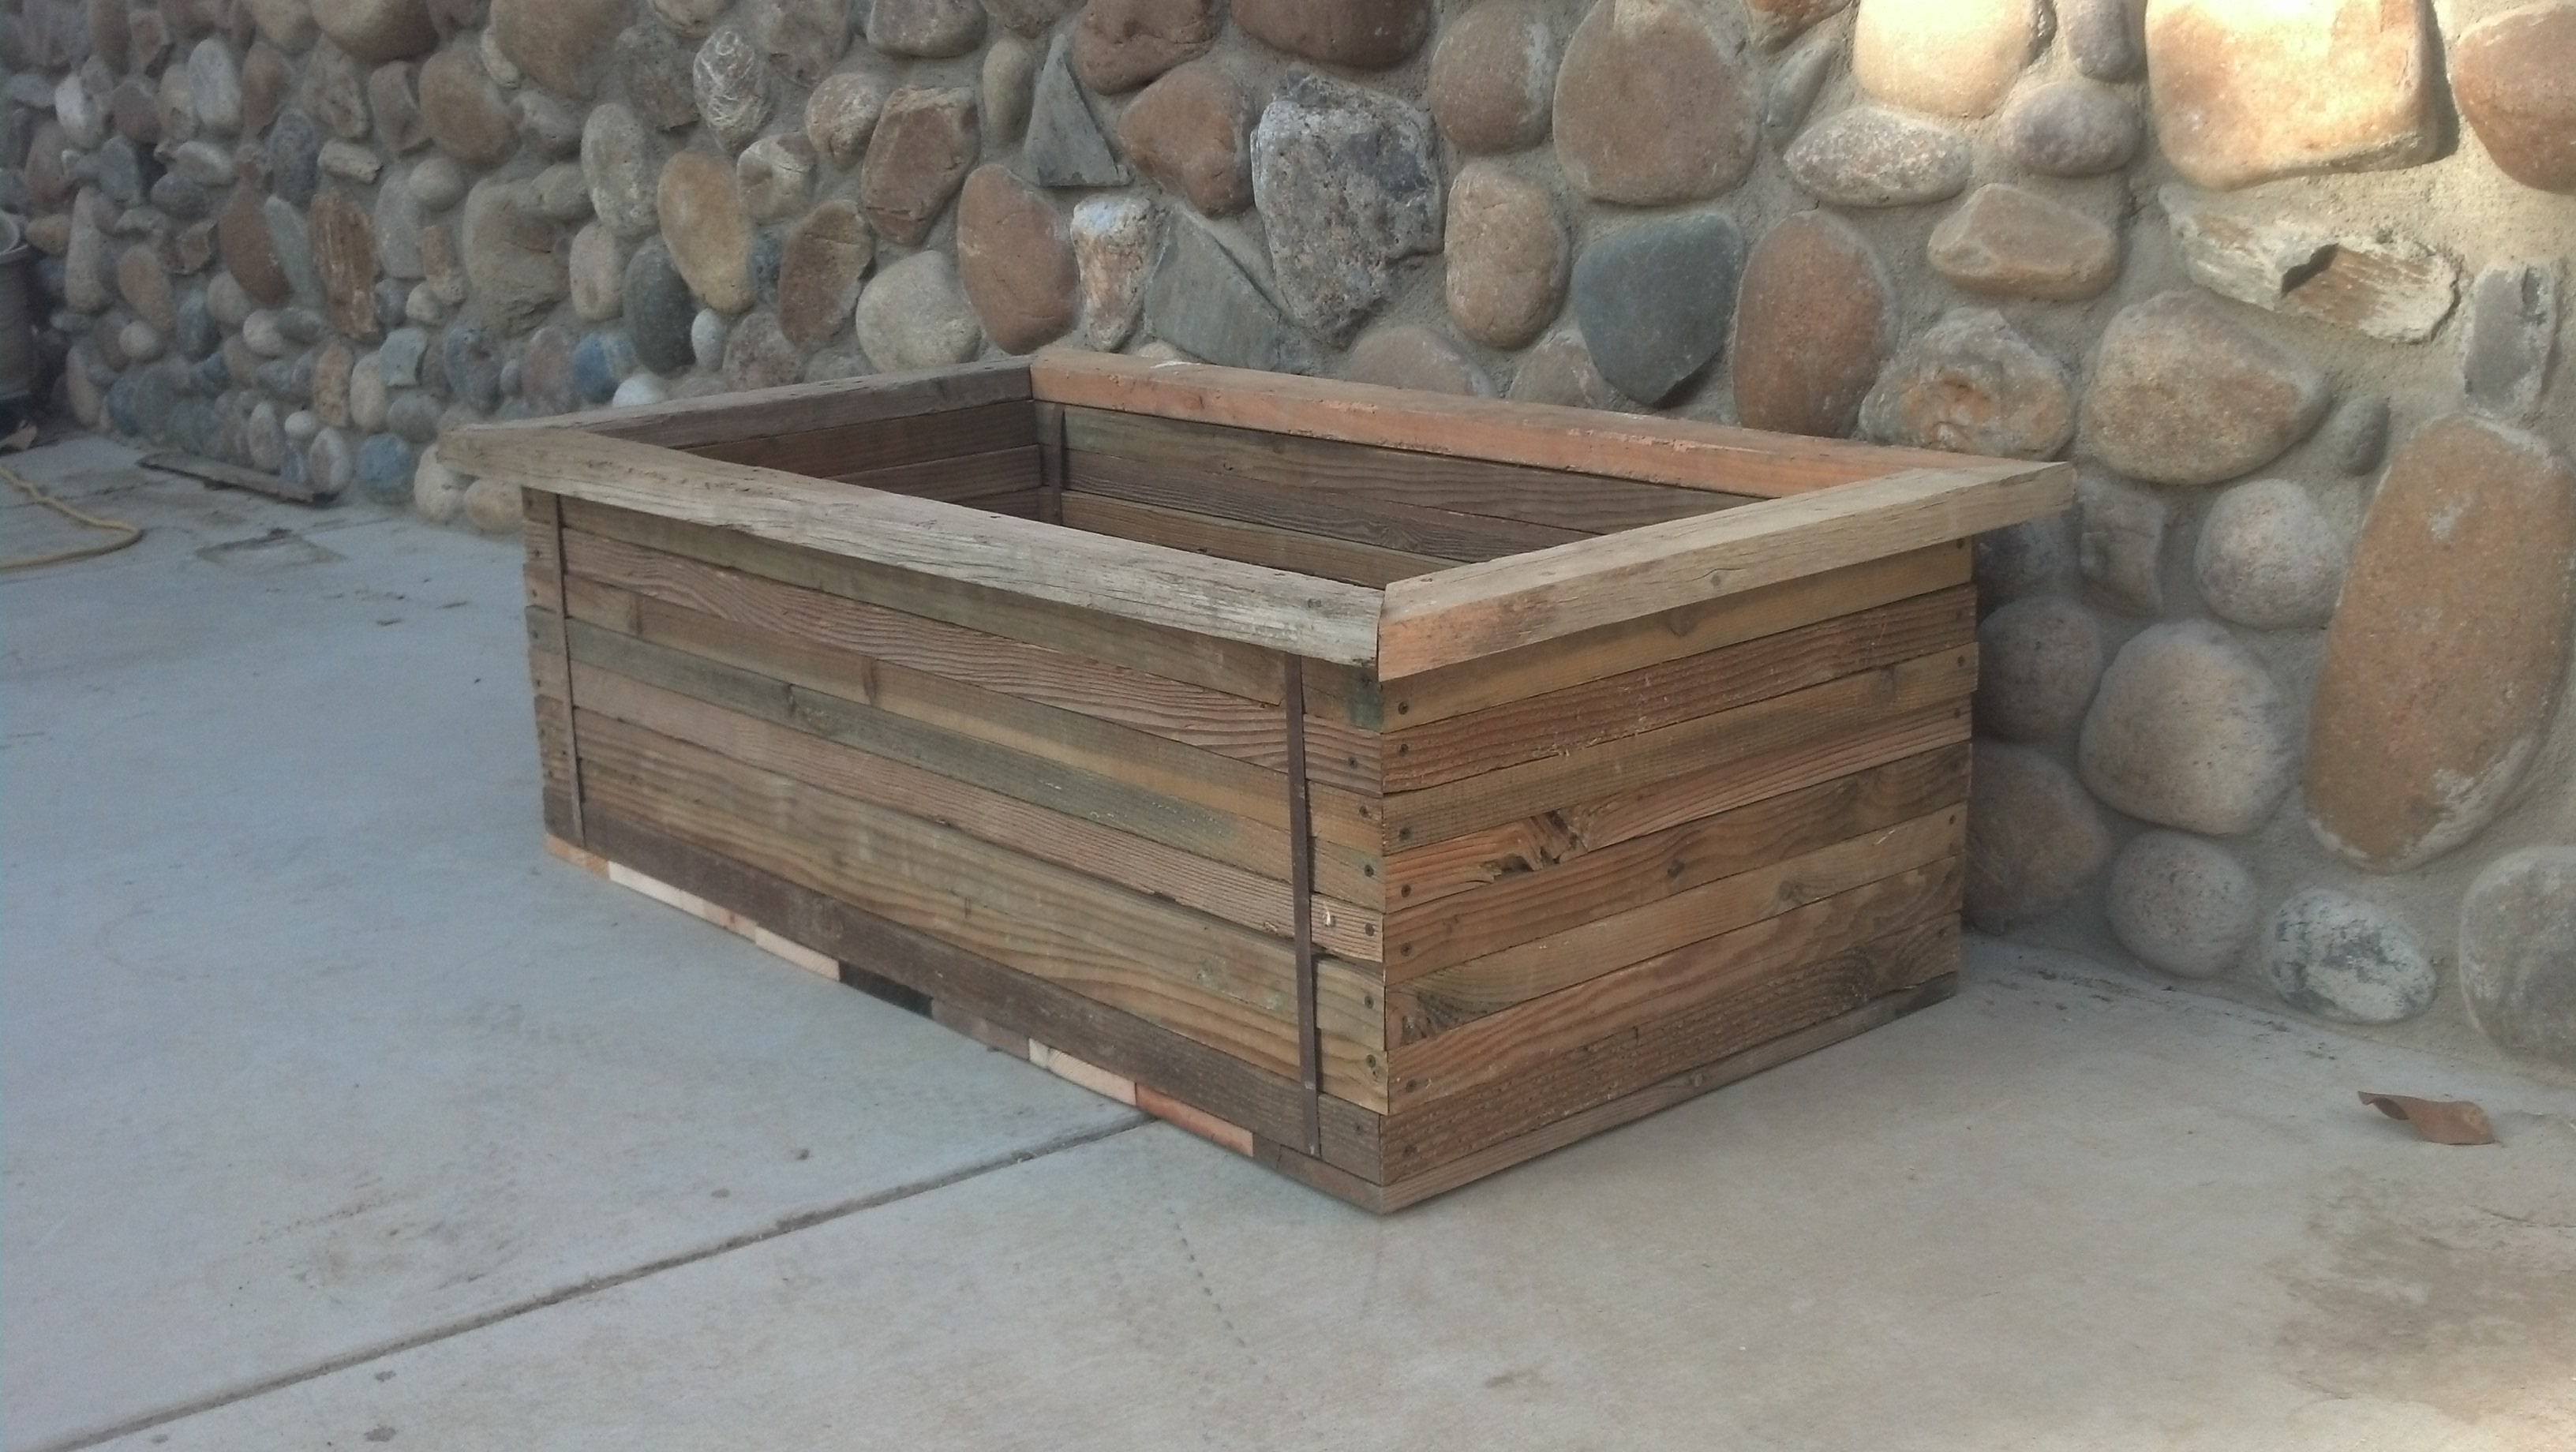 Rustic Western Reclaimed Wood Planter